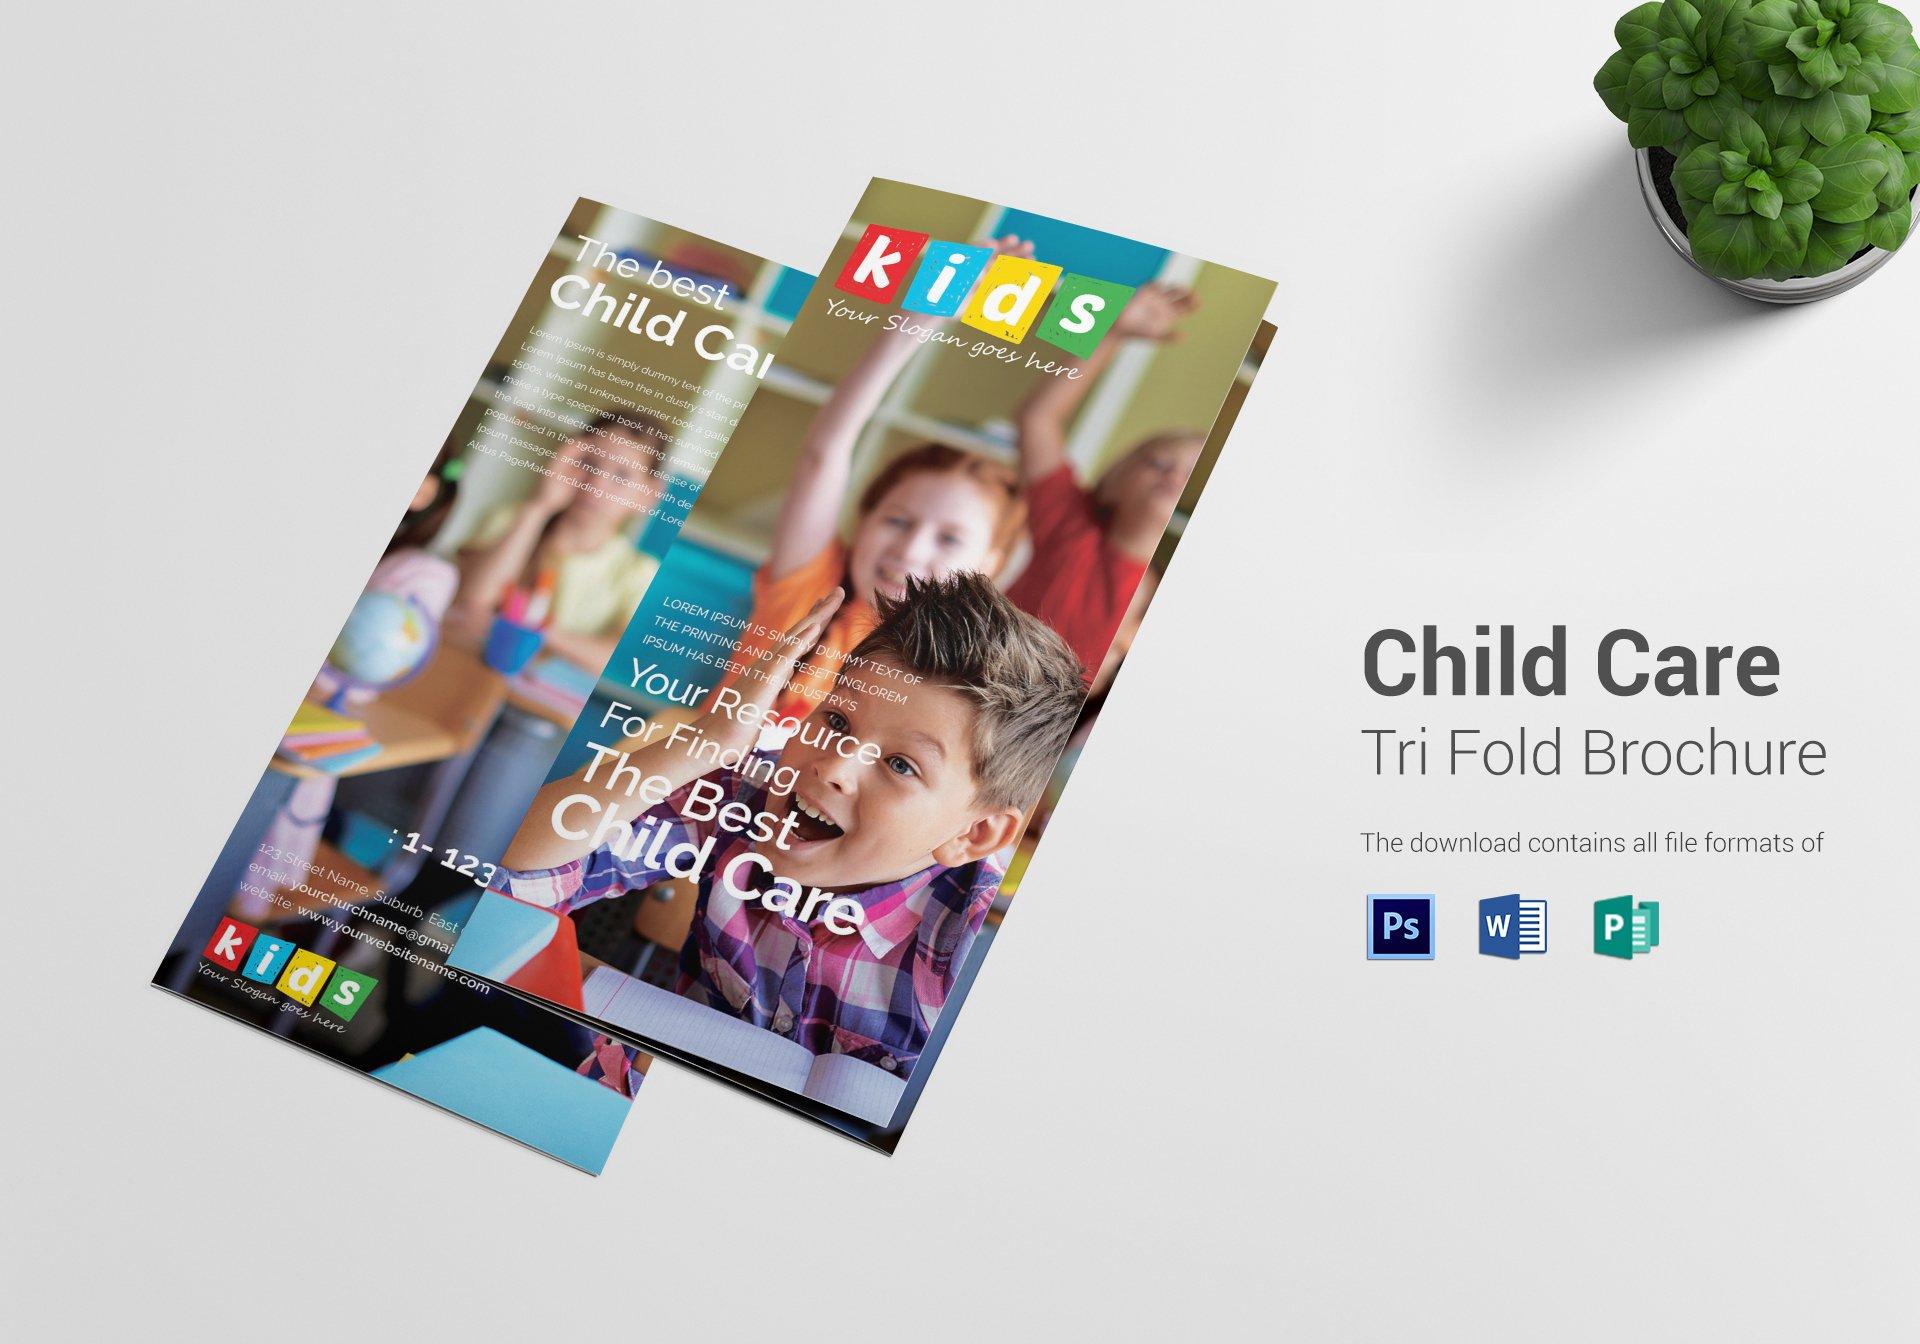 best kids care trifold brochure